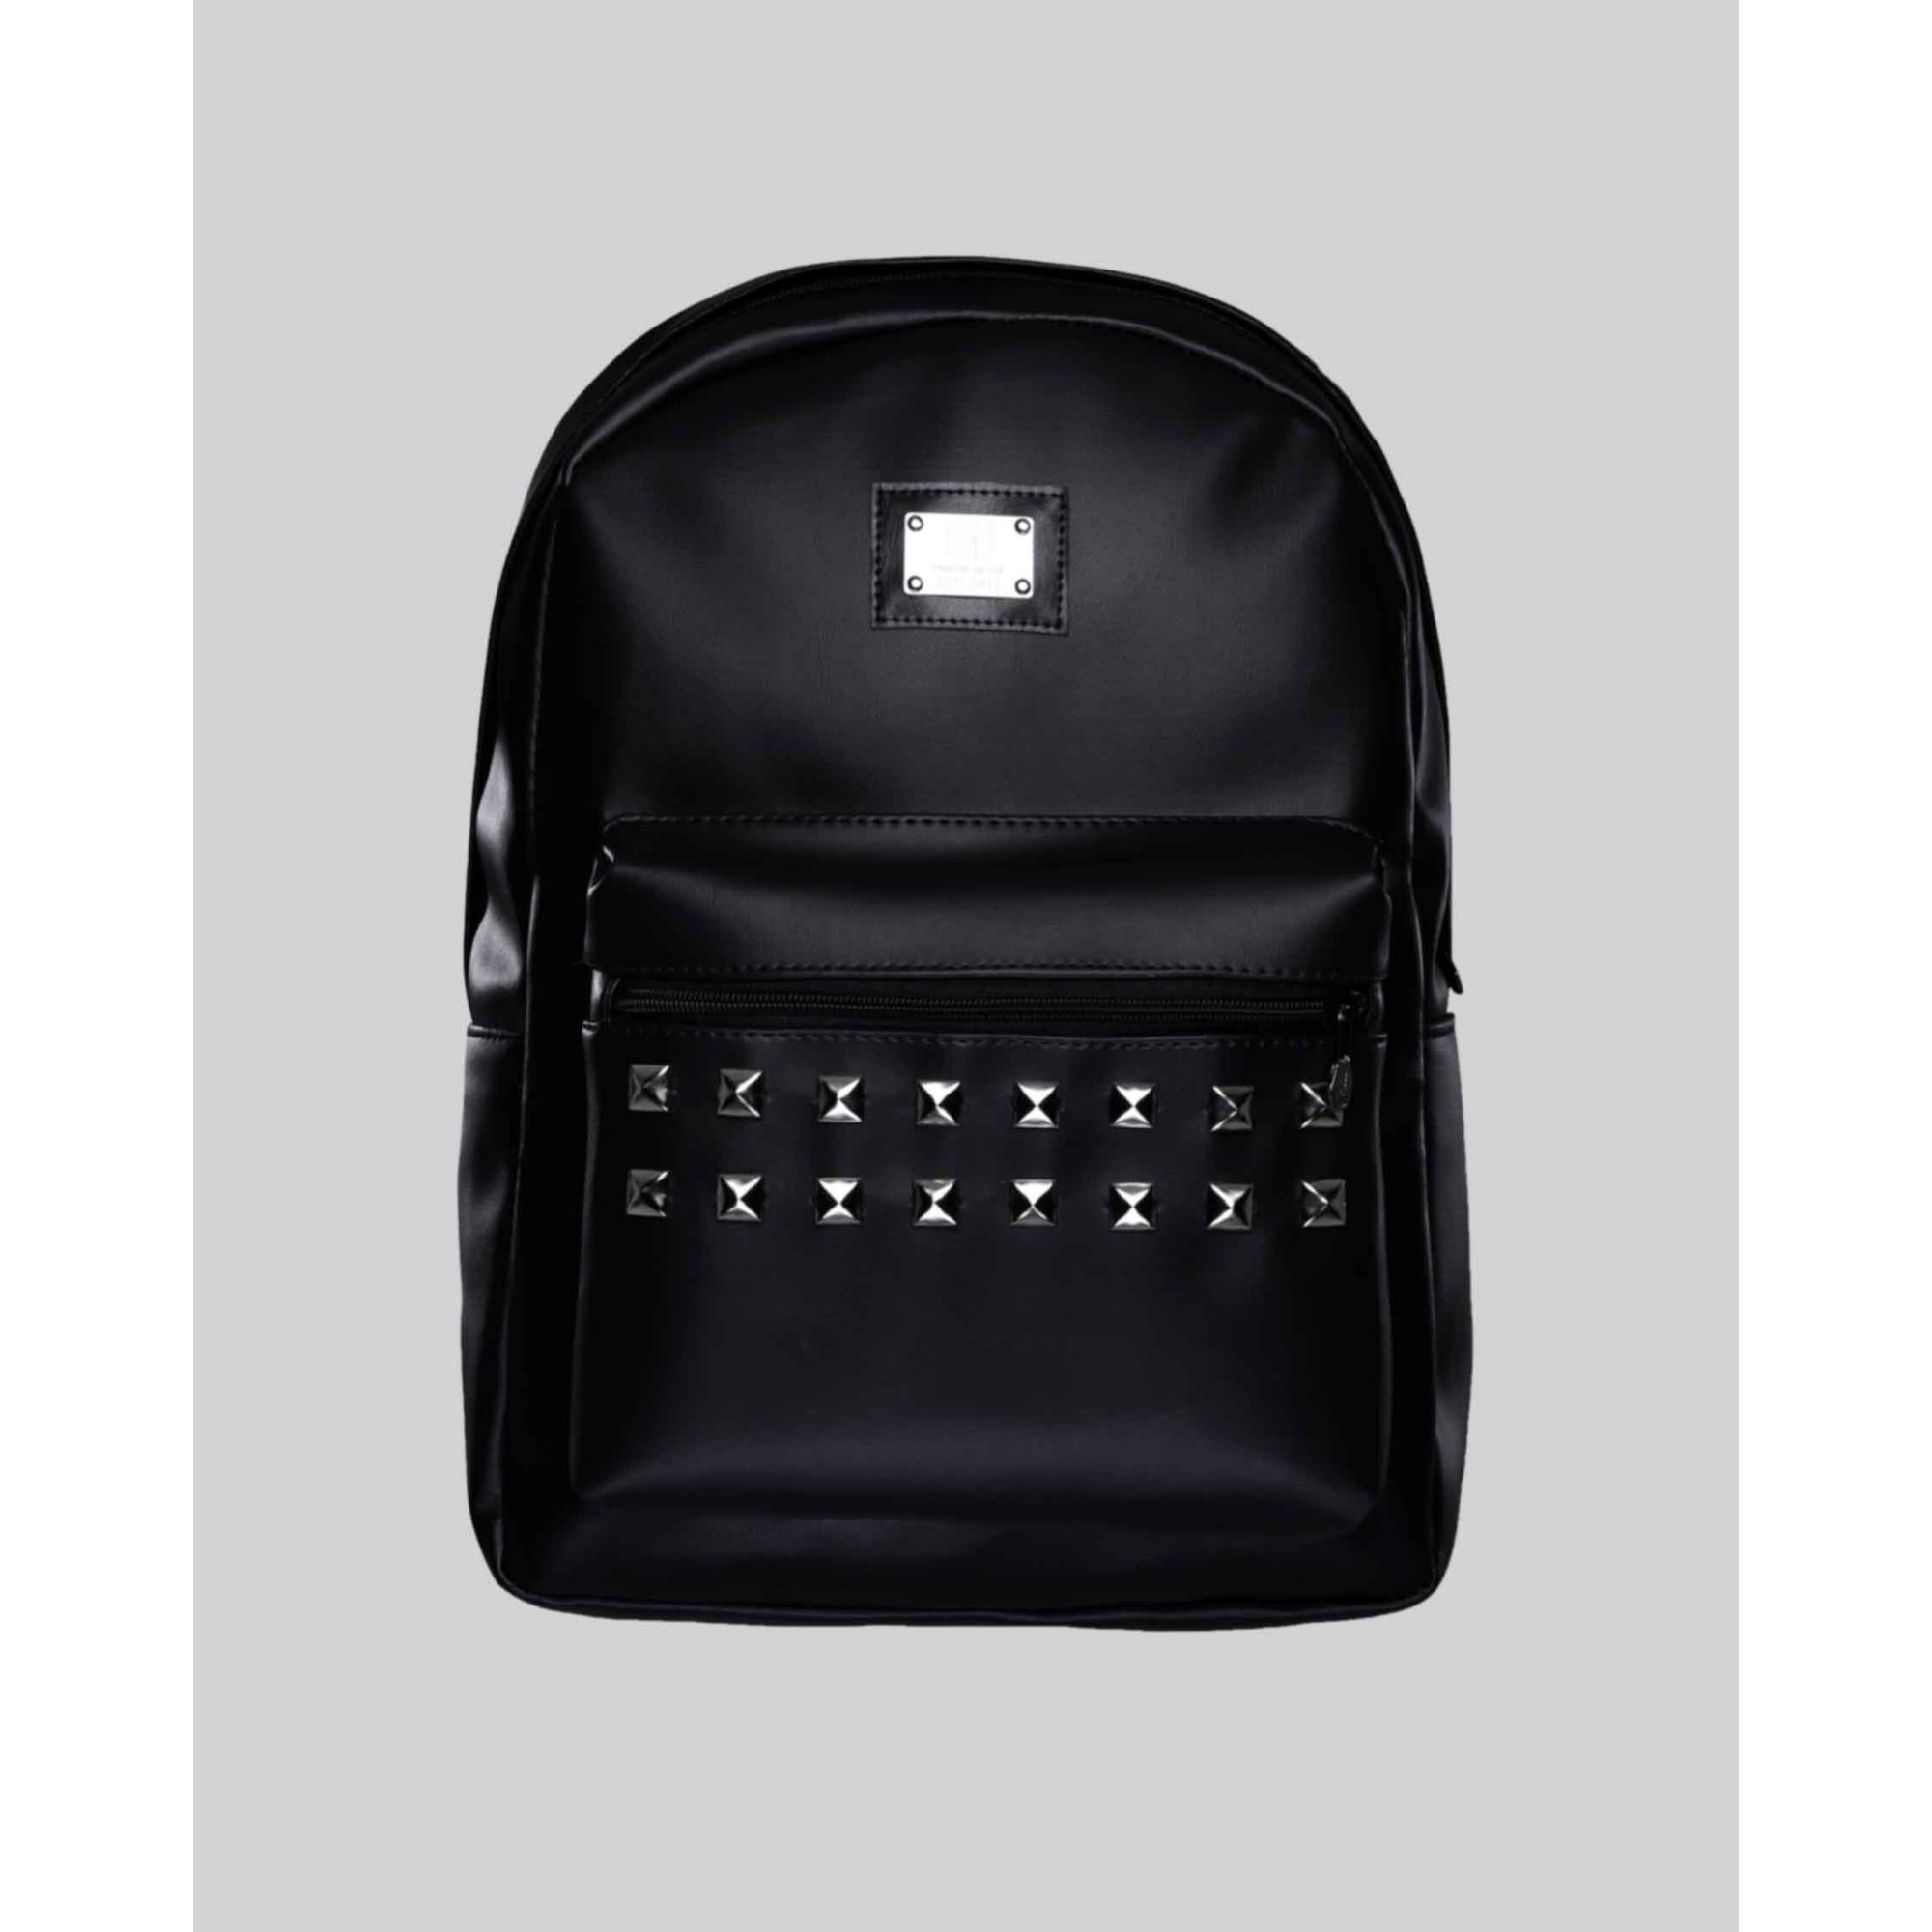 Mochila Buh Leather Spike Black